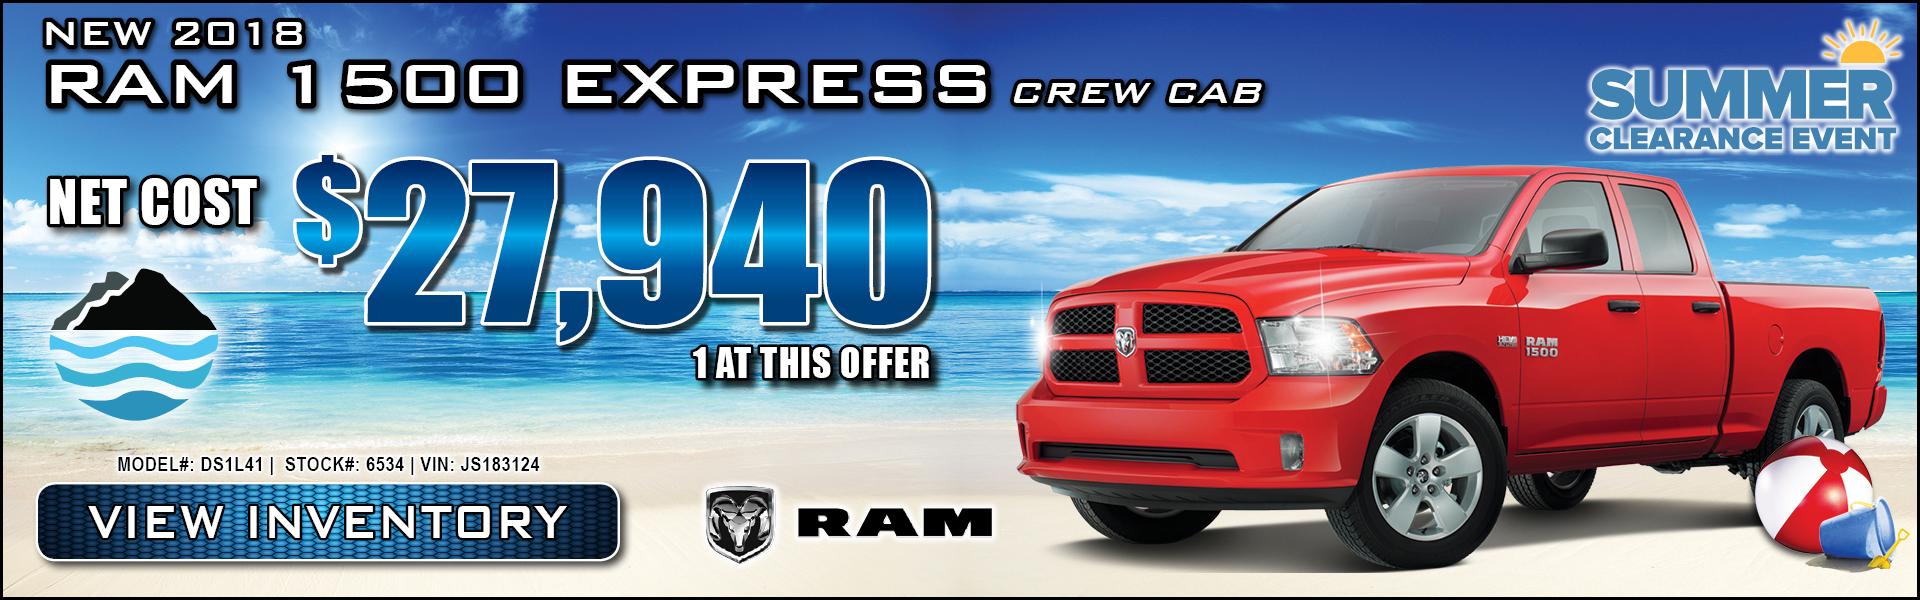 Ram 1500 Express $27,940